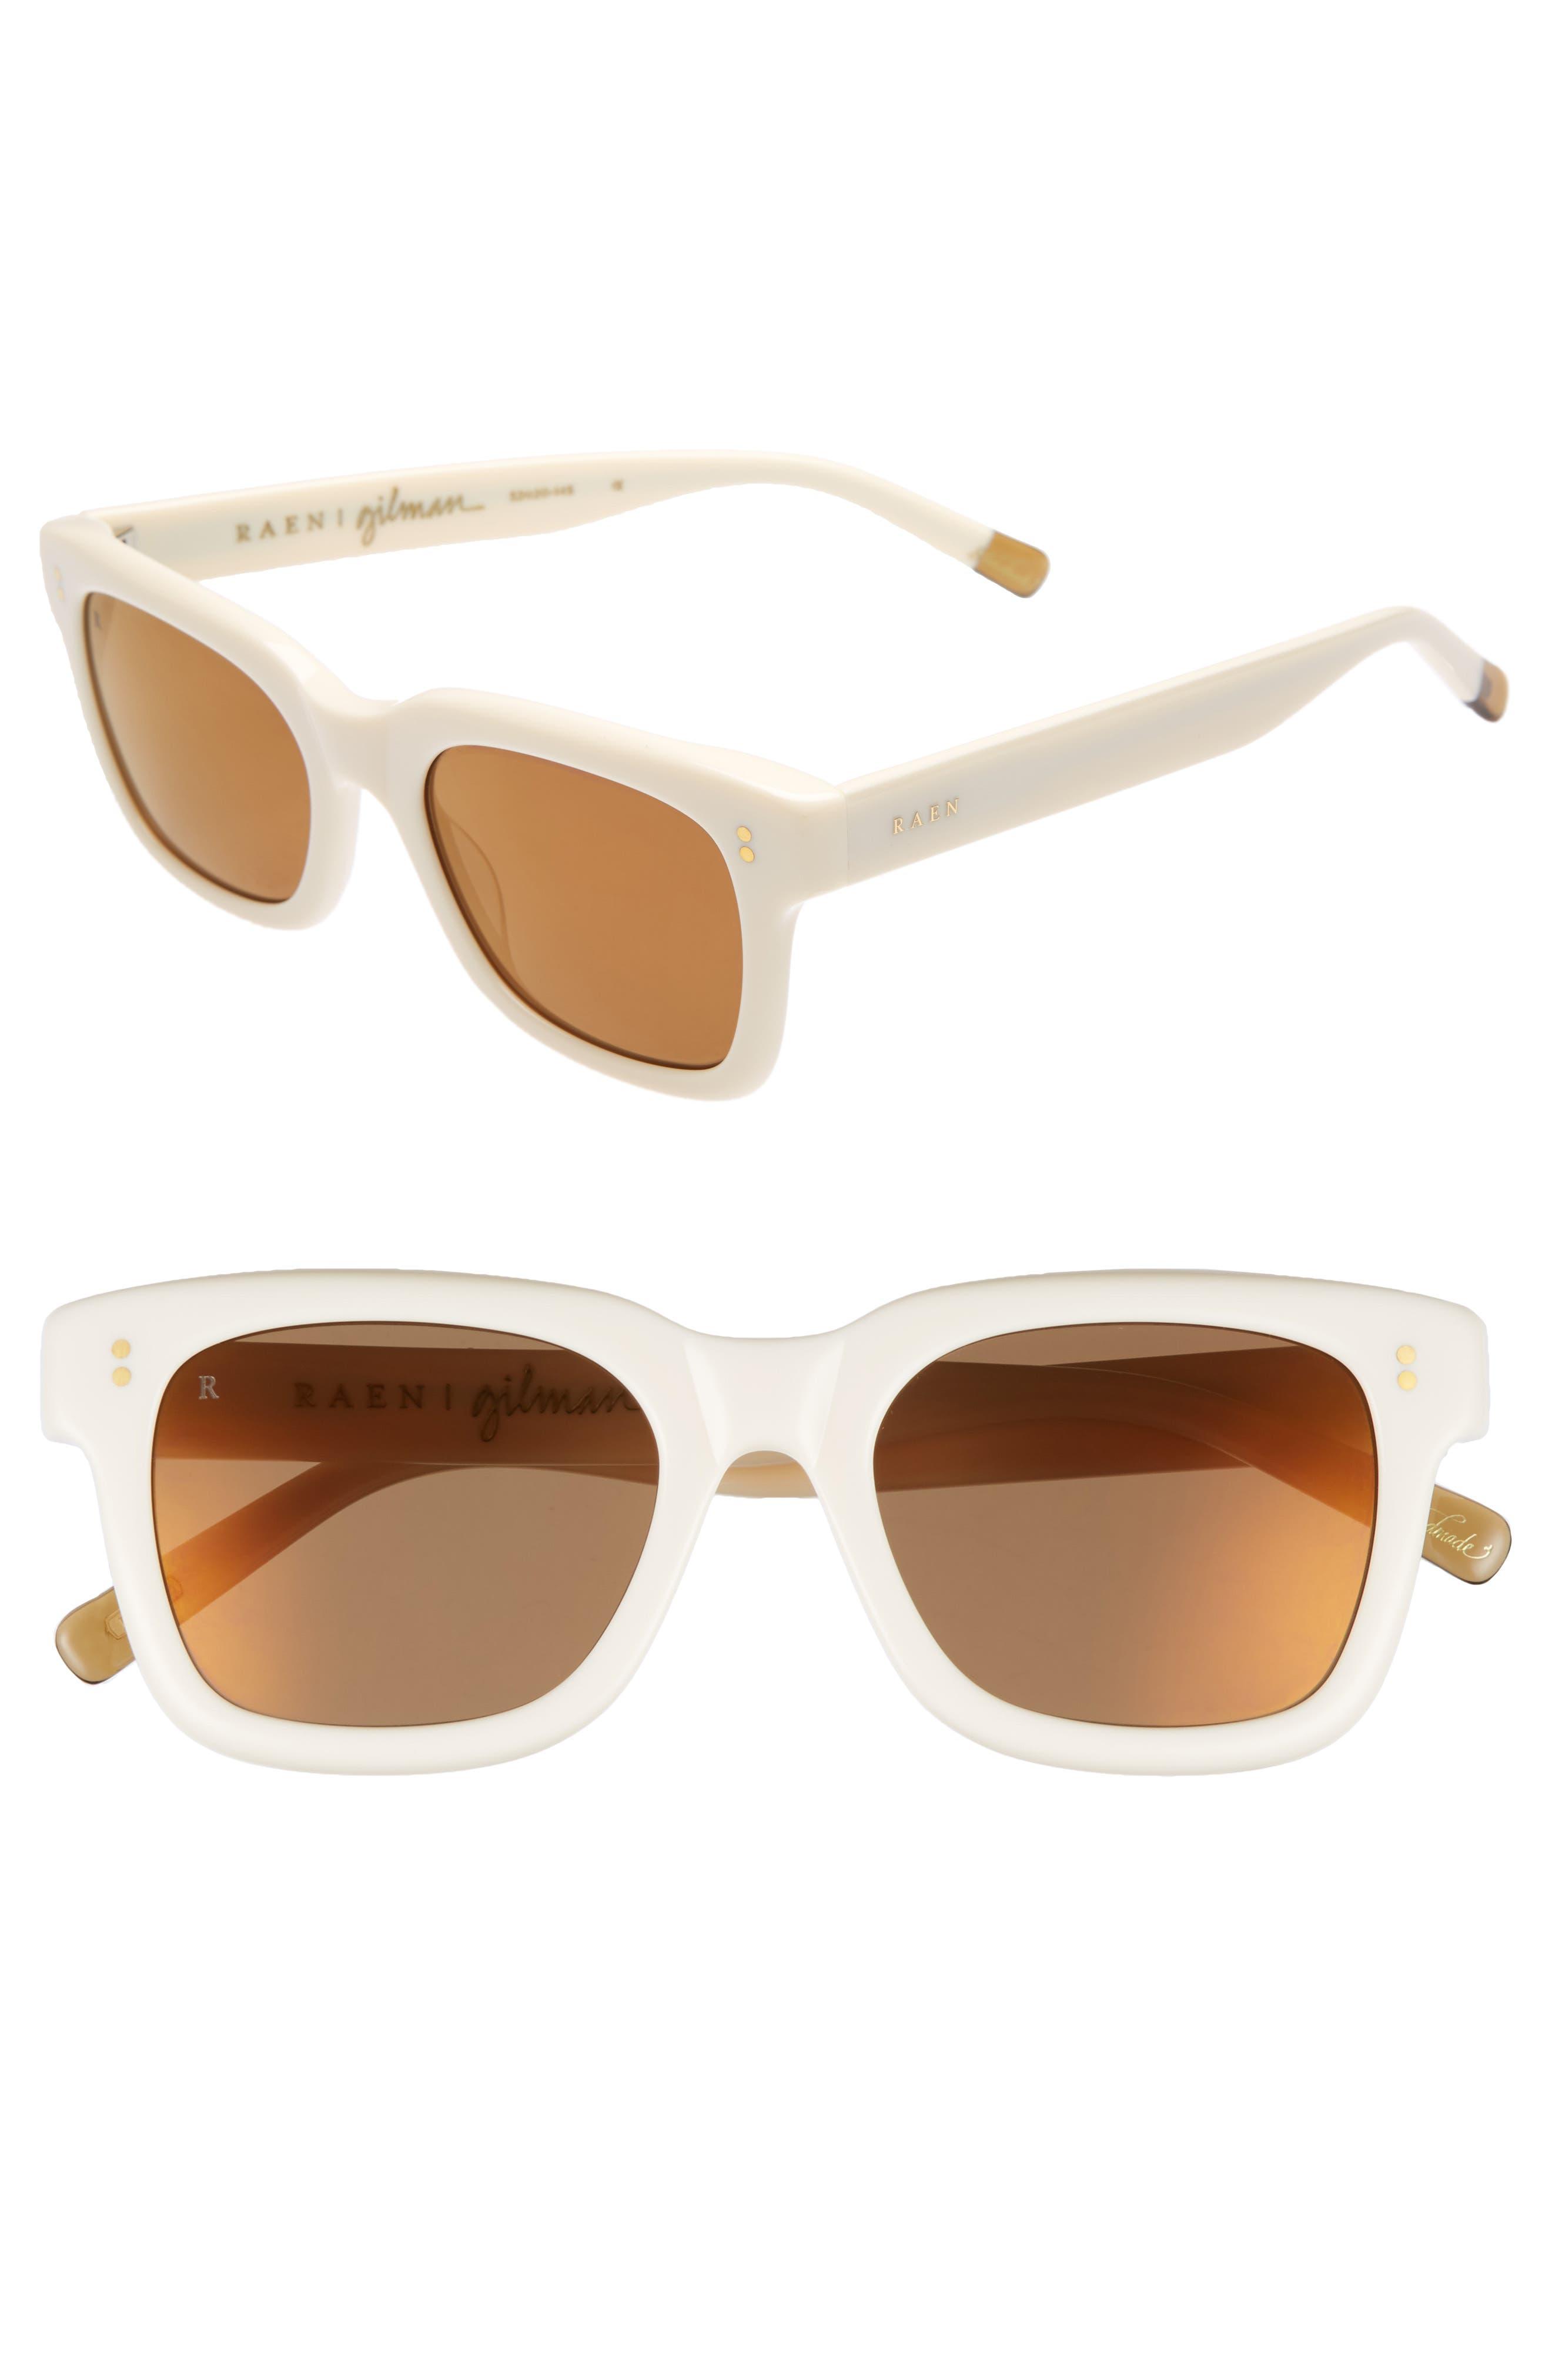 Gilman 52mm Mirrored Polarized Sunglasses,                         Main,                         color, Rose/ Brown Silver Mirror